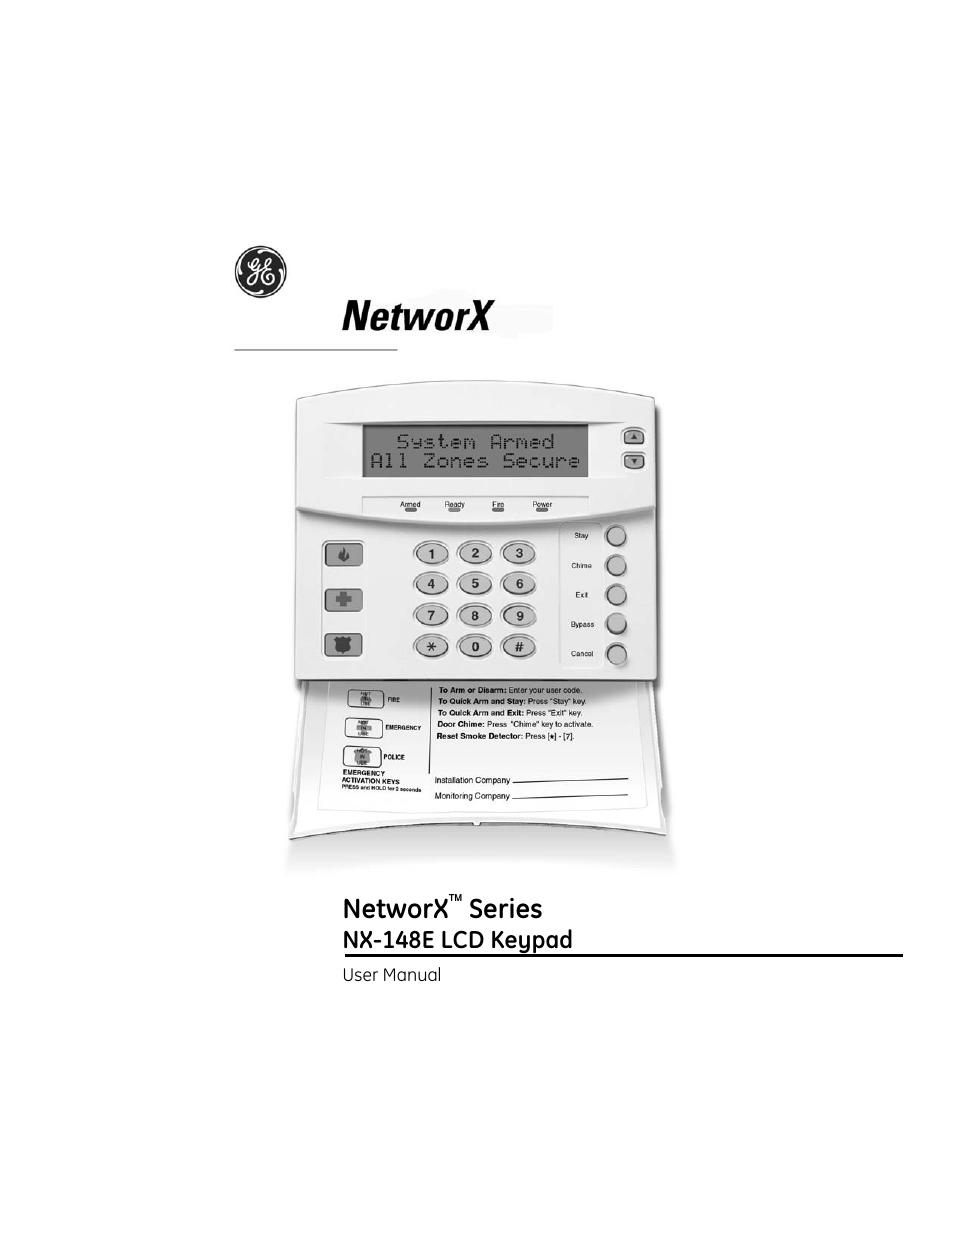 interlogix nx 148e user manual 30 pages rh manualsdir com ge networx nx-148e  programming manual ge networx nx-8 installation manual